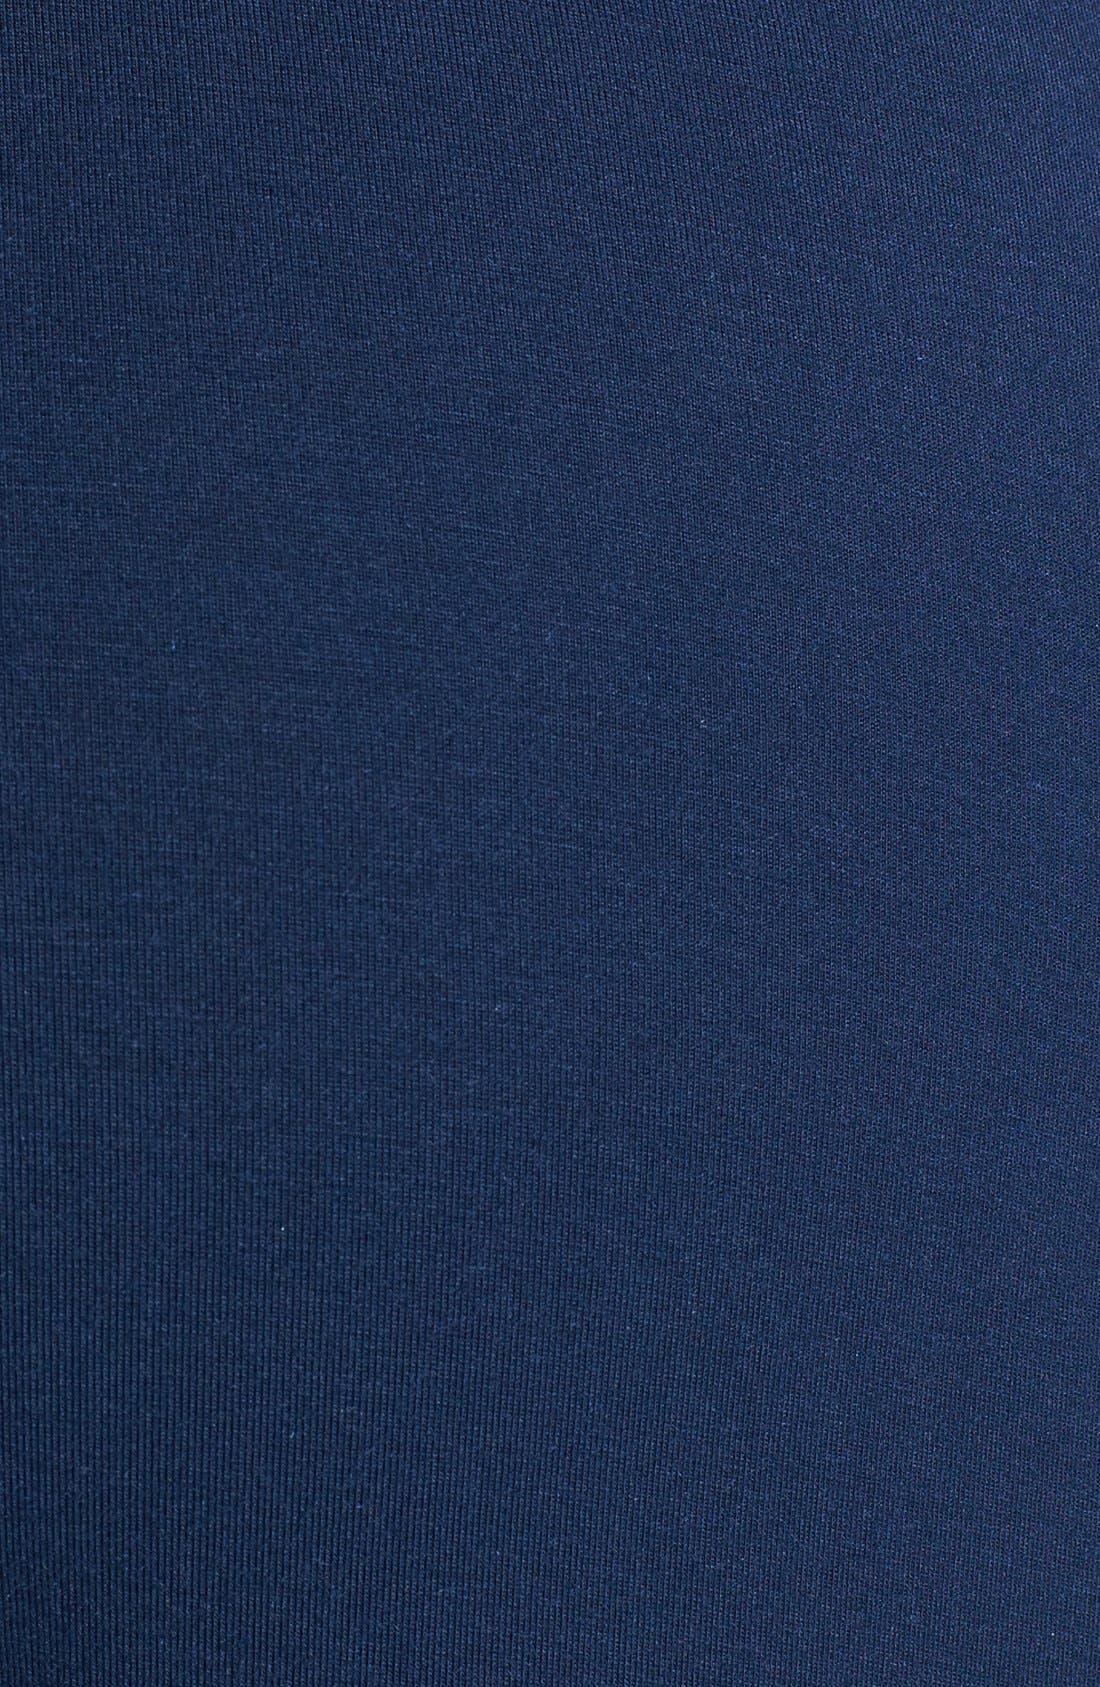 Alternate Image 4  - Eberjey 'Gisele' Lace Jersey Pajama Pants